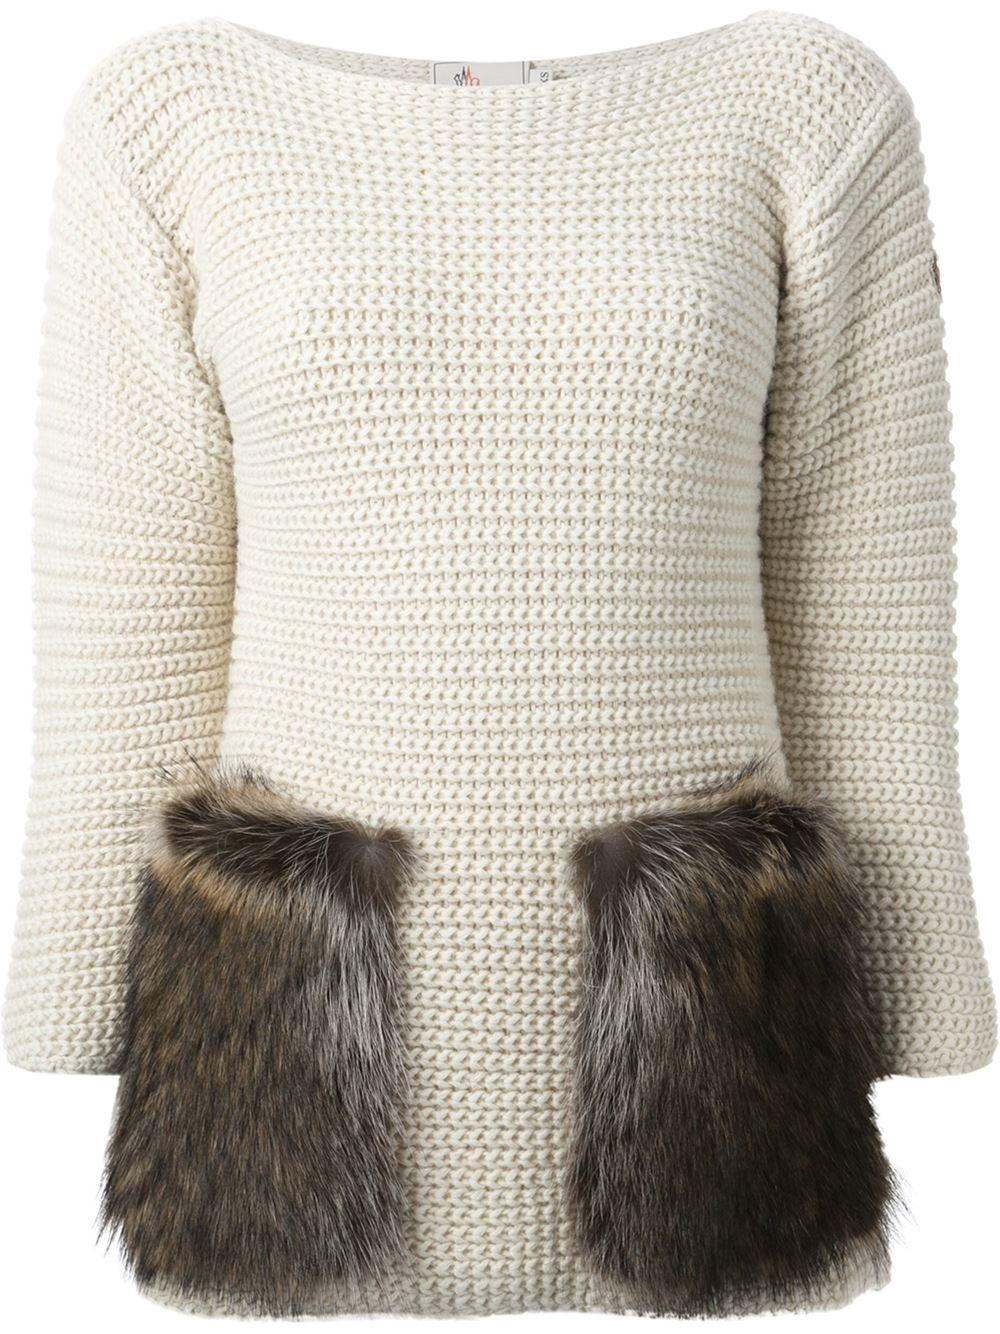 Moncler Grenoble Knitwear